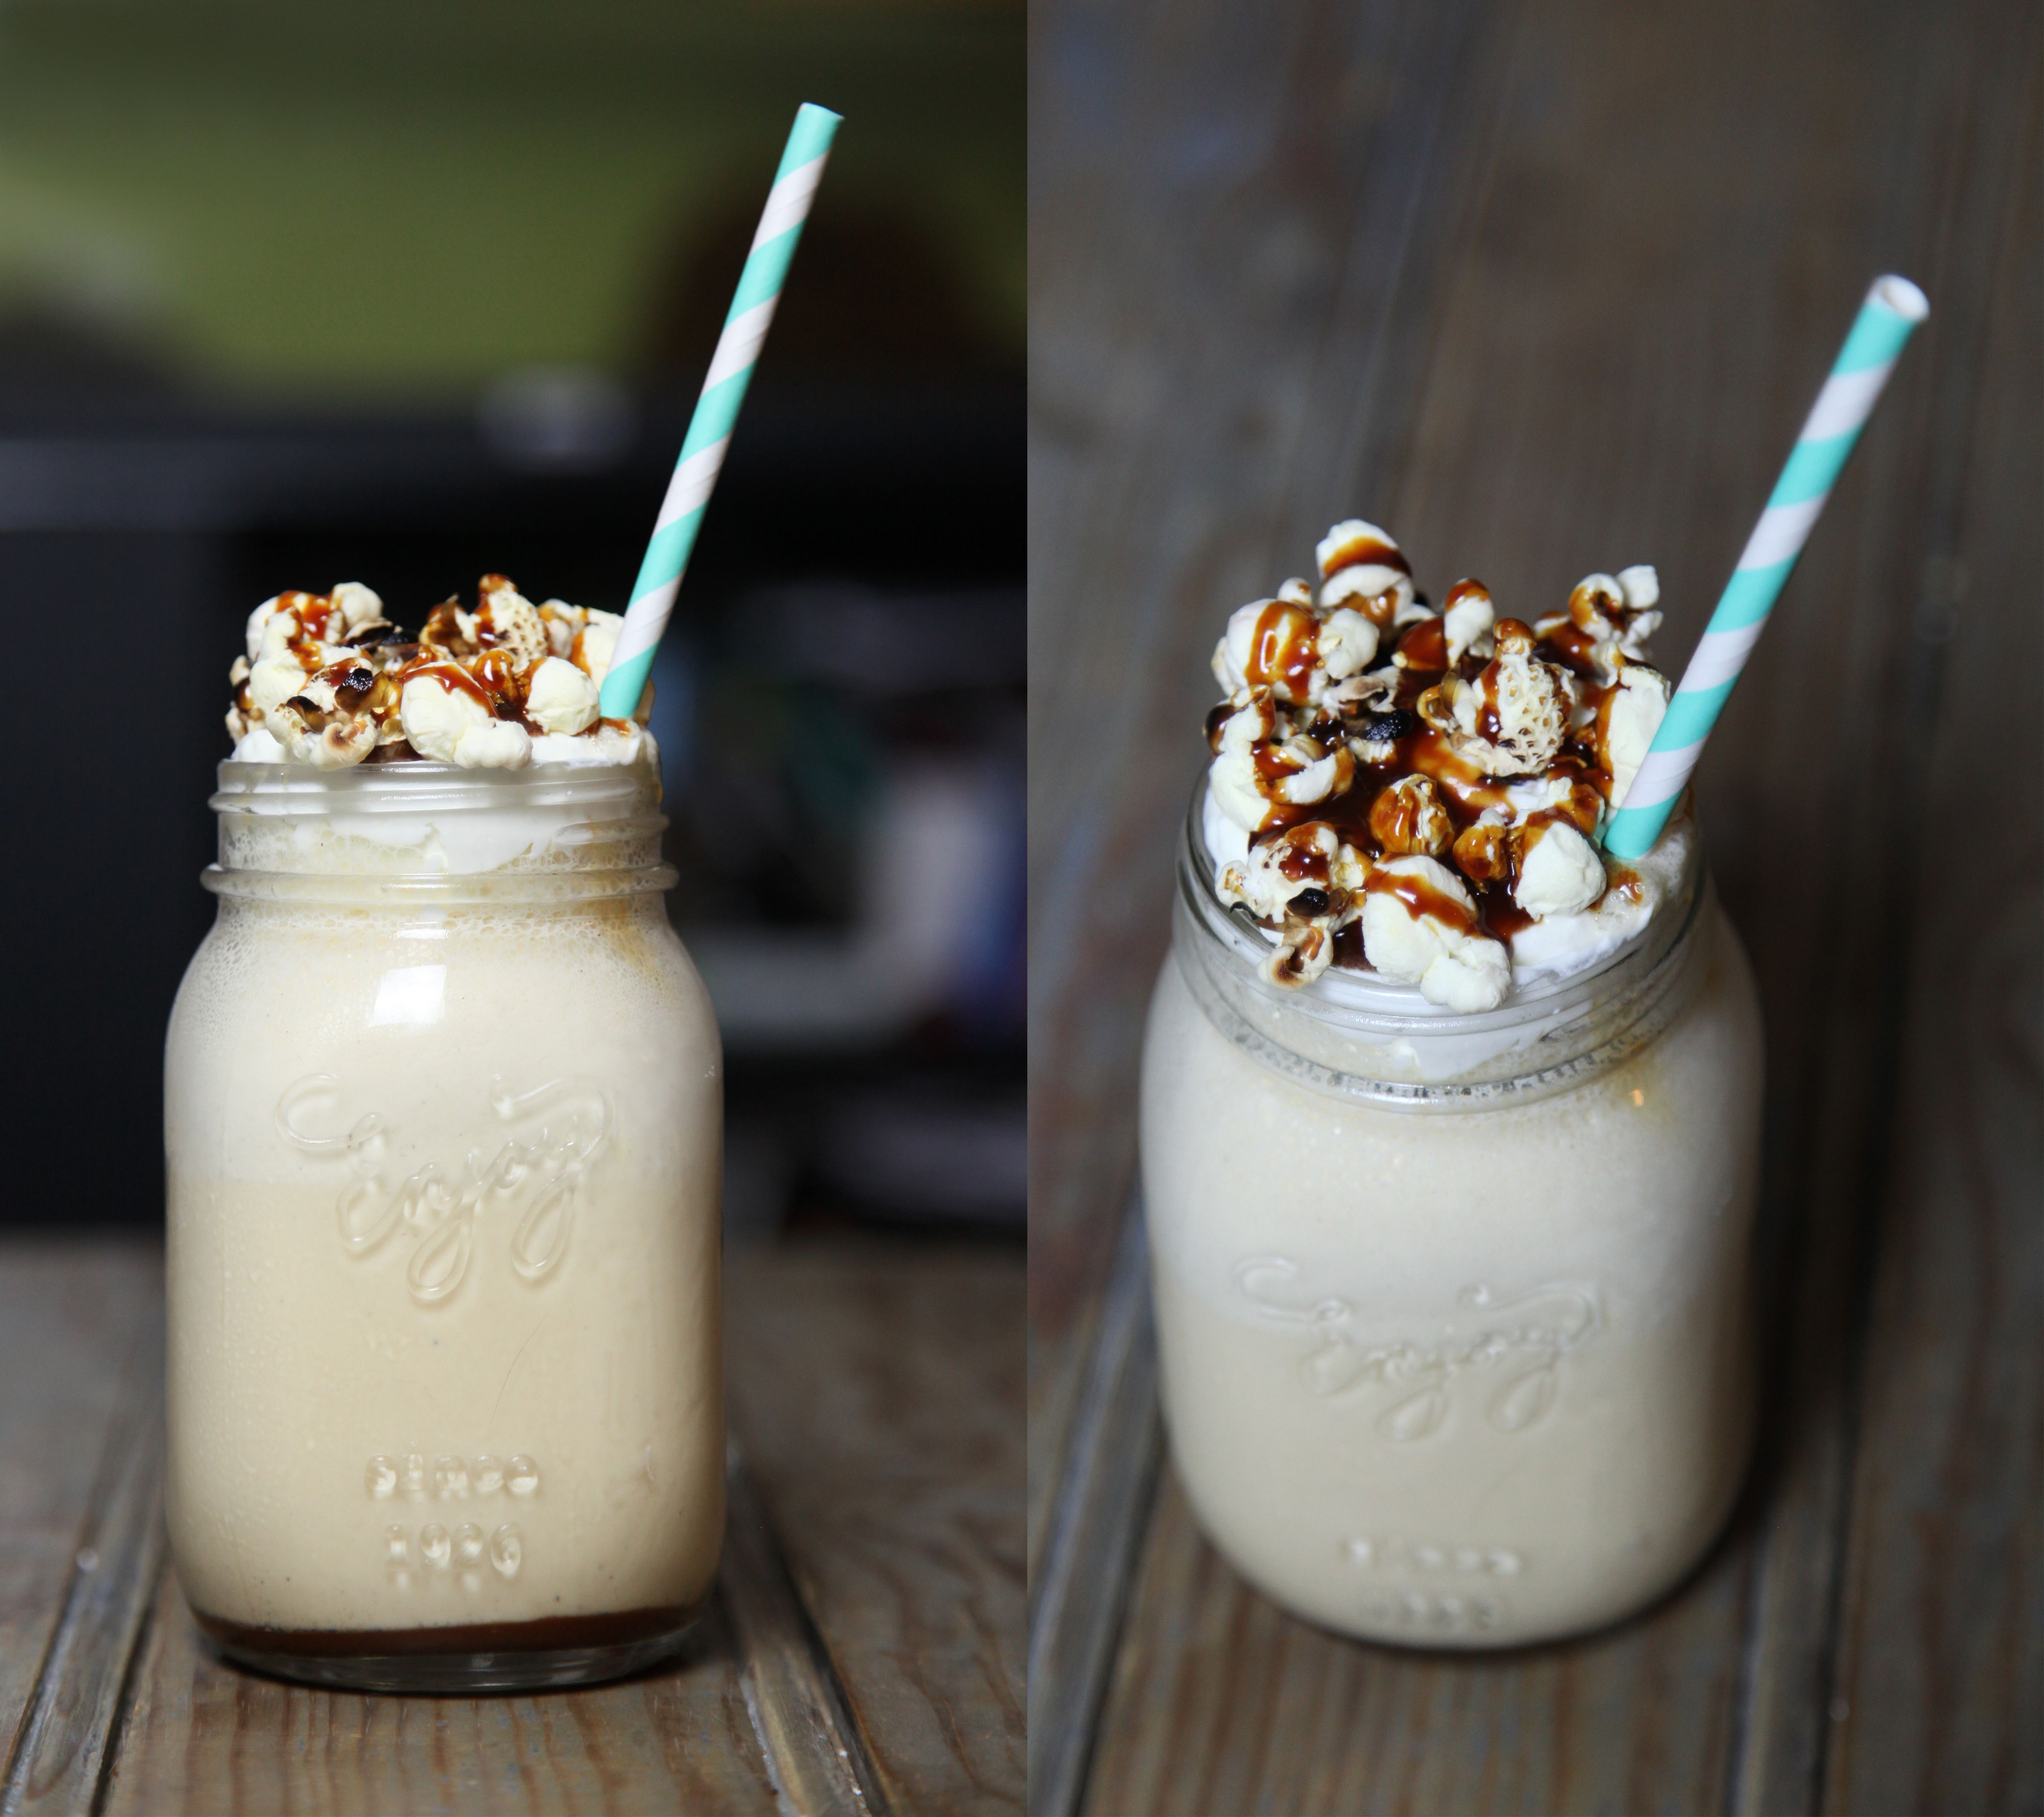 Milkshake vanille caramel Milkshake Smoothie